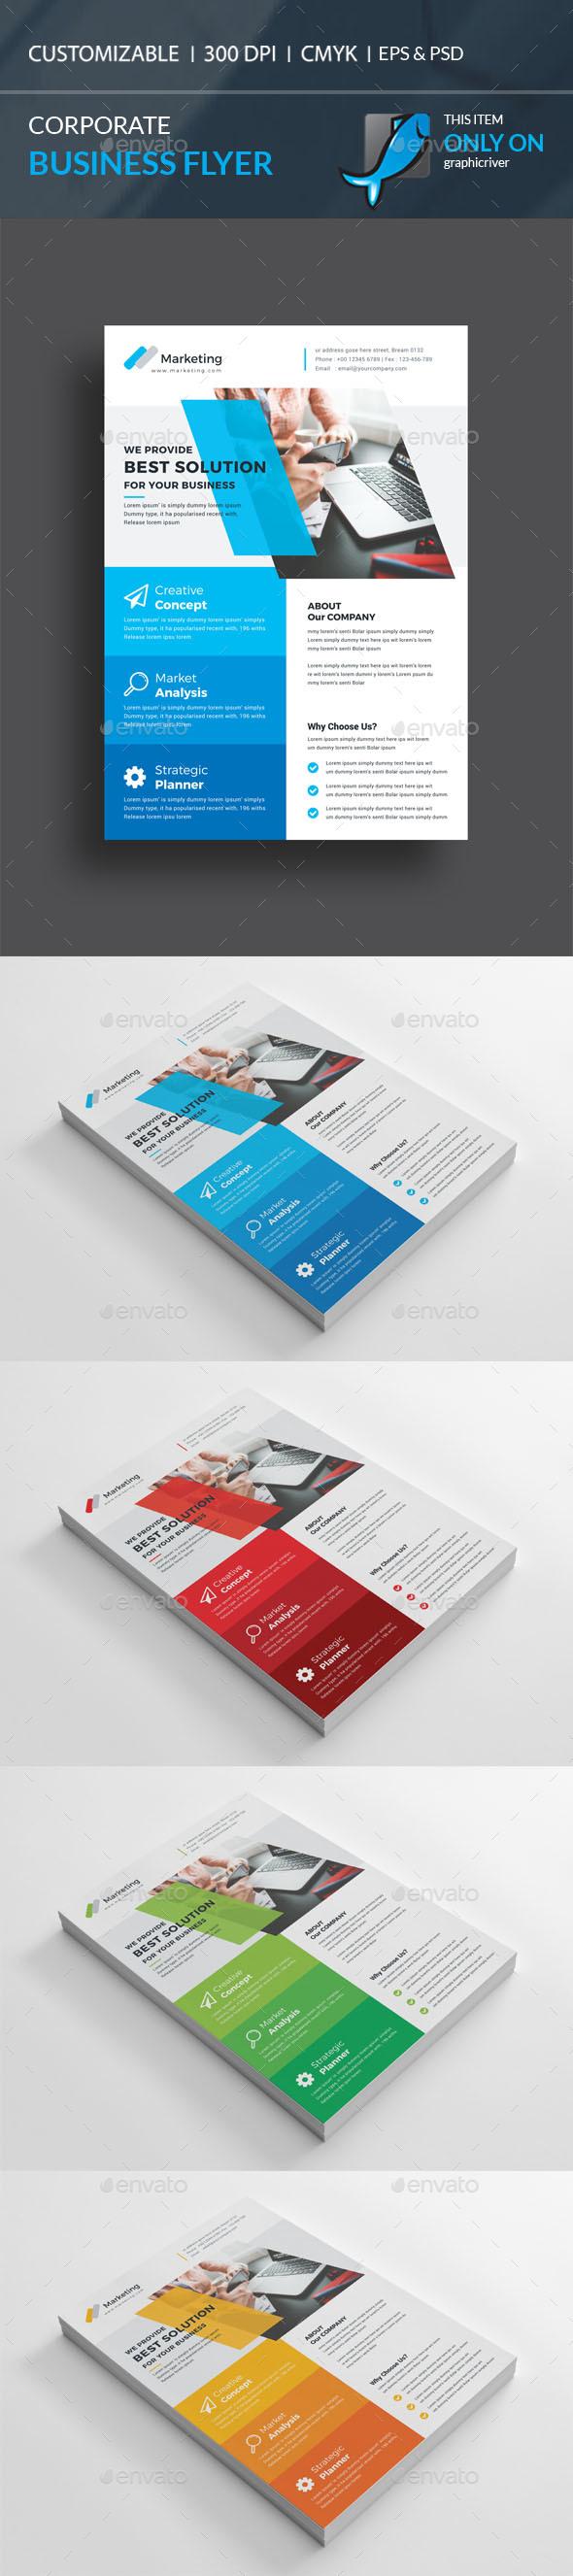 Corporate Flyer Template PSD, Vector EPS, AI Illustrator | Vistas ...